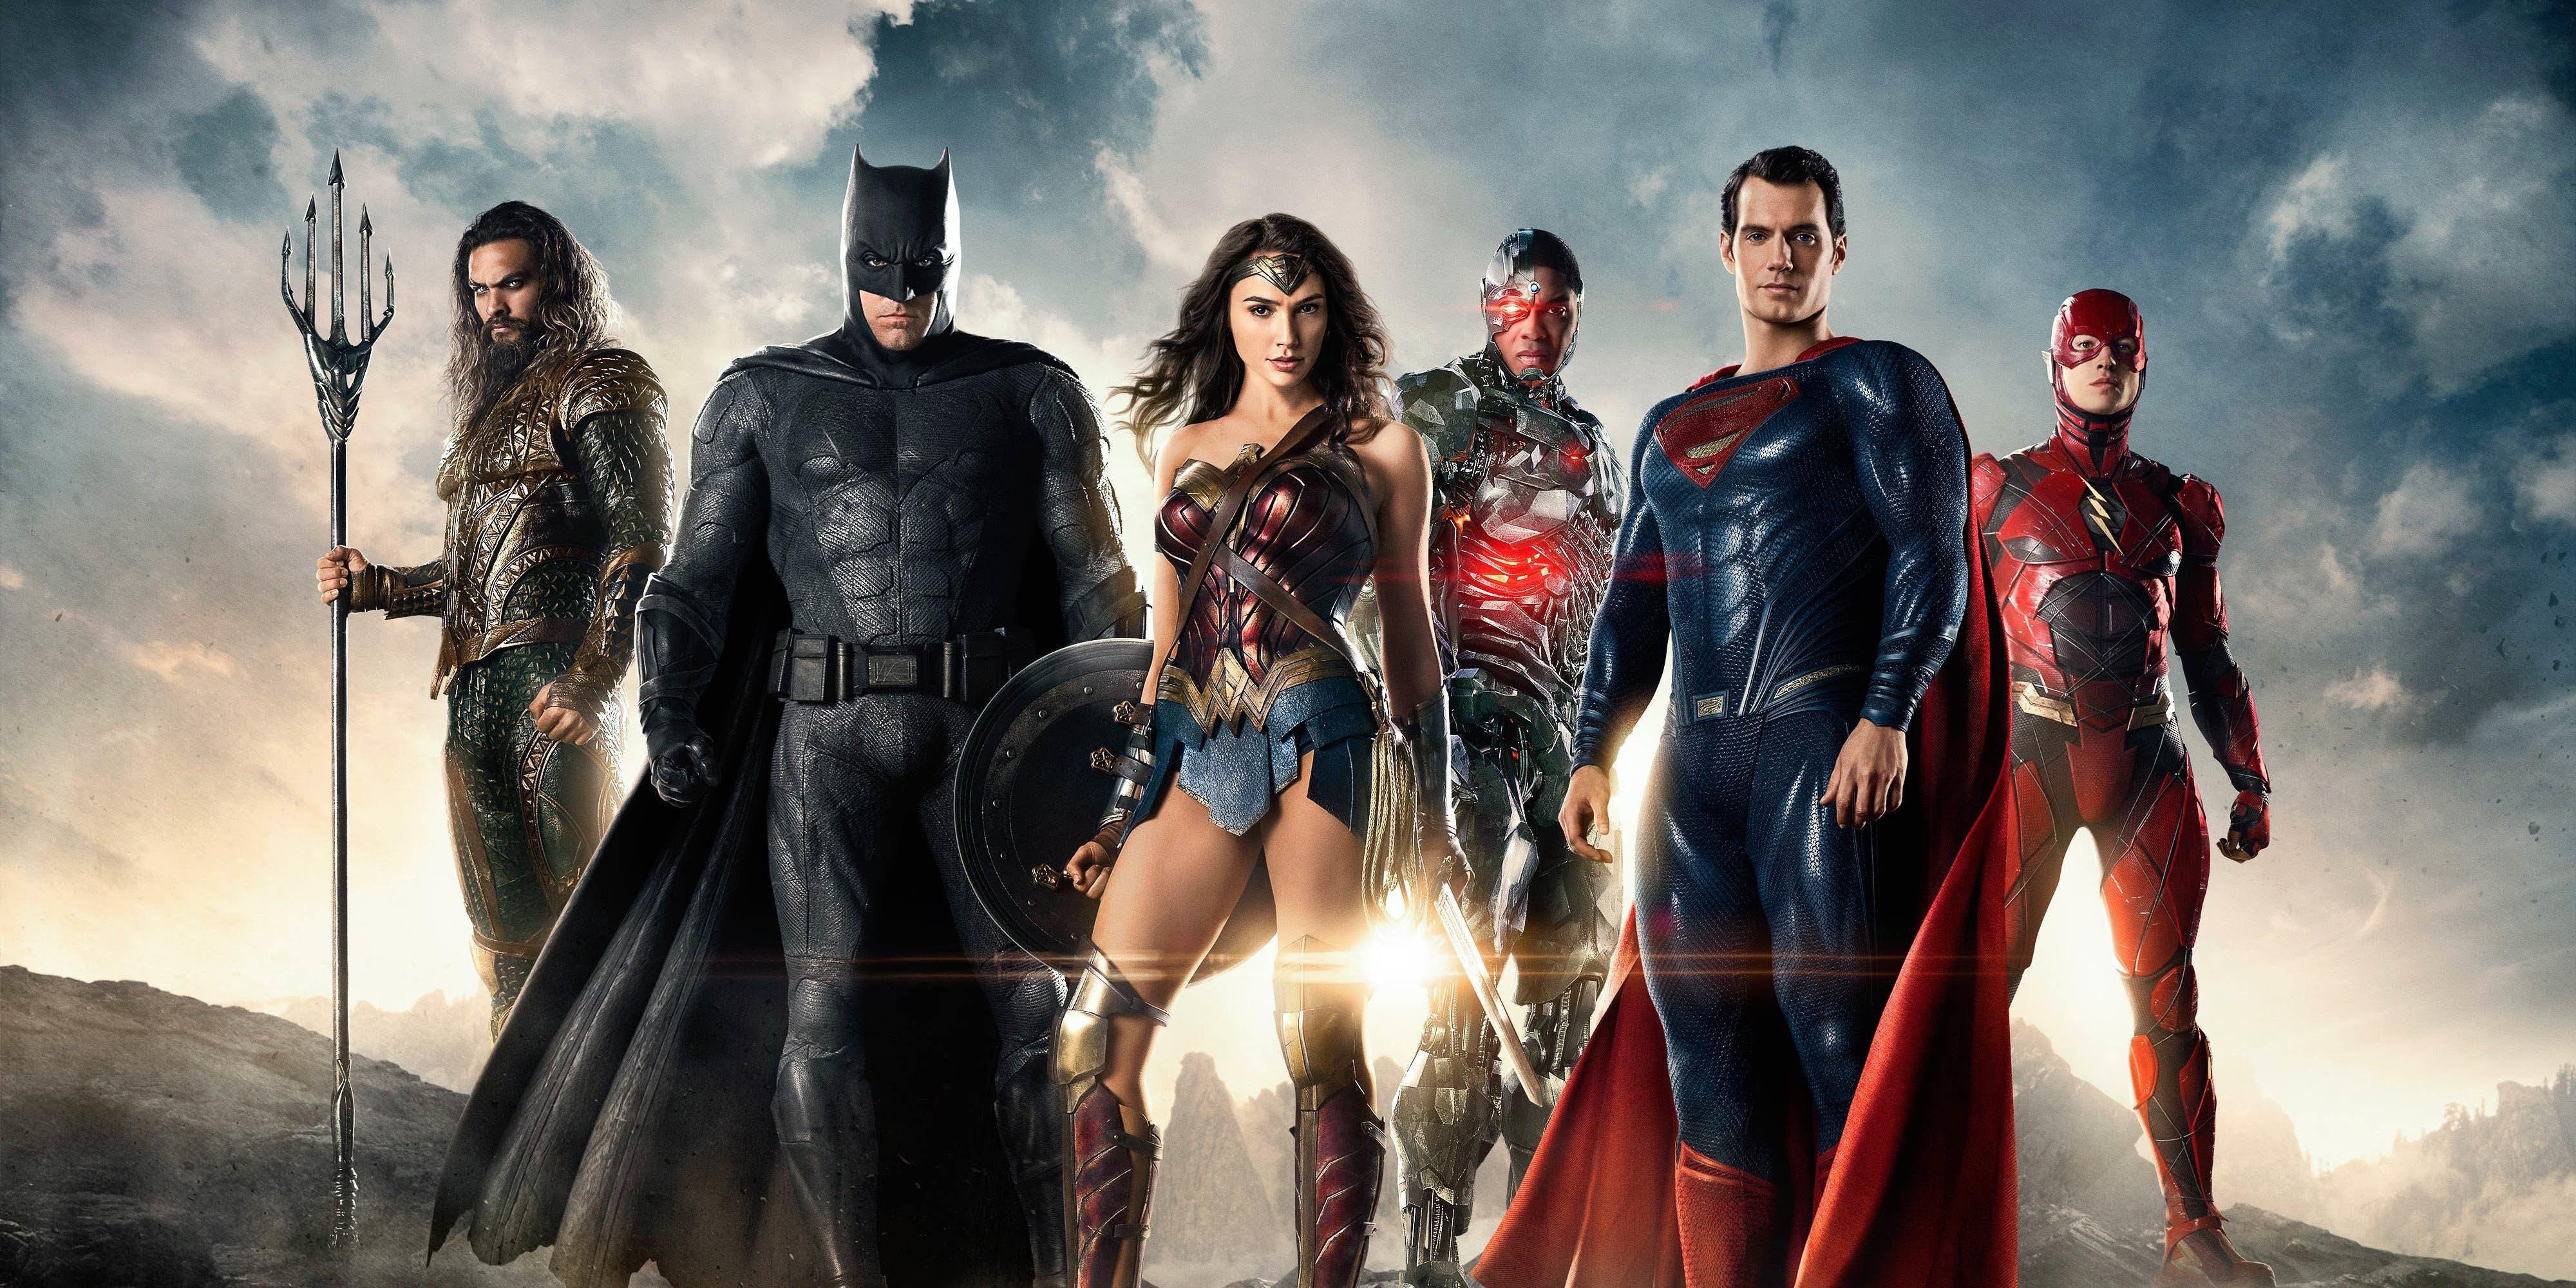 justice-league-movie-header.jpg